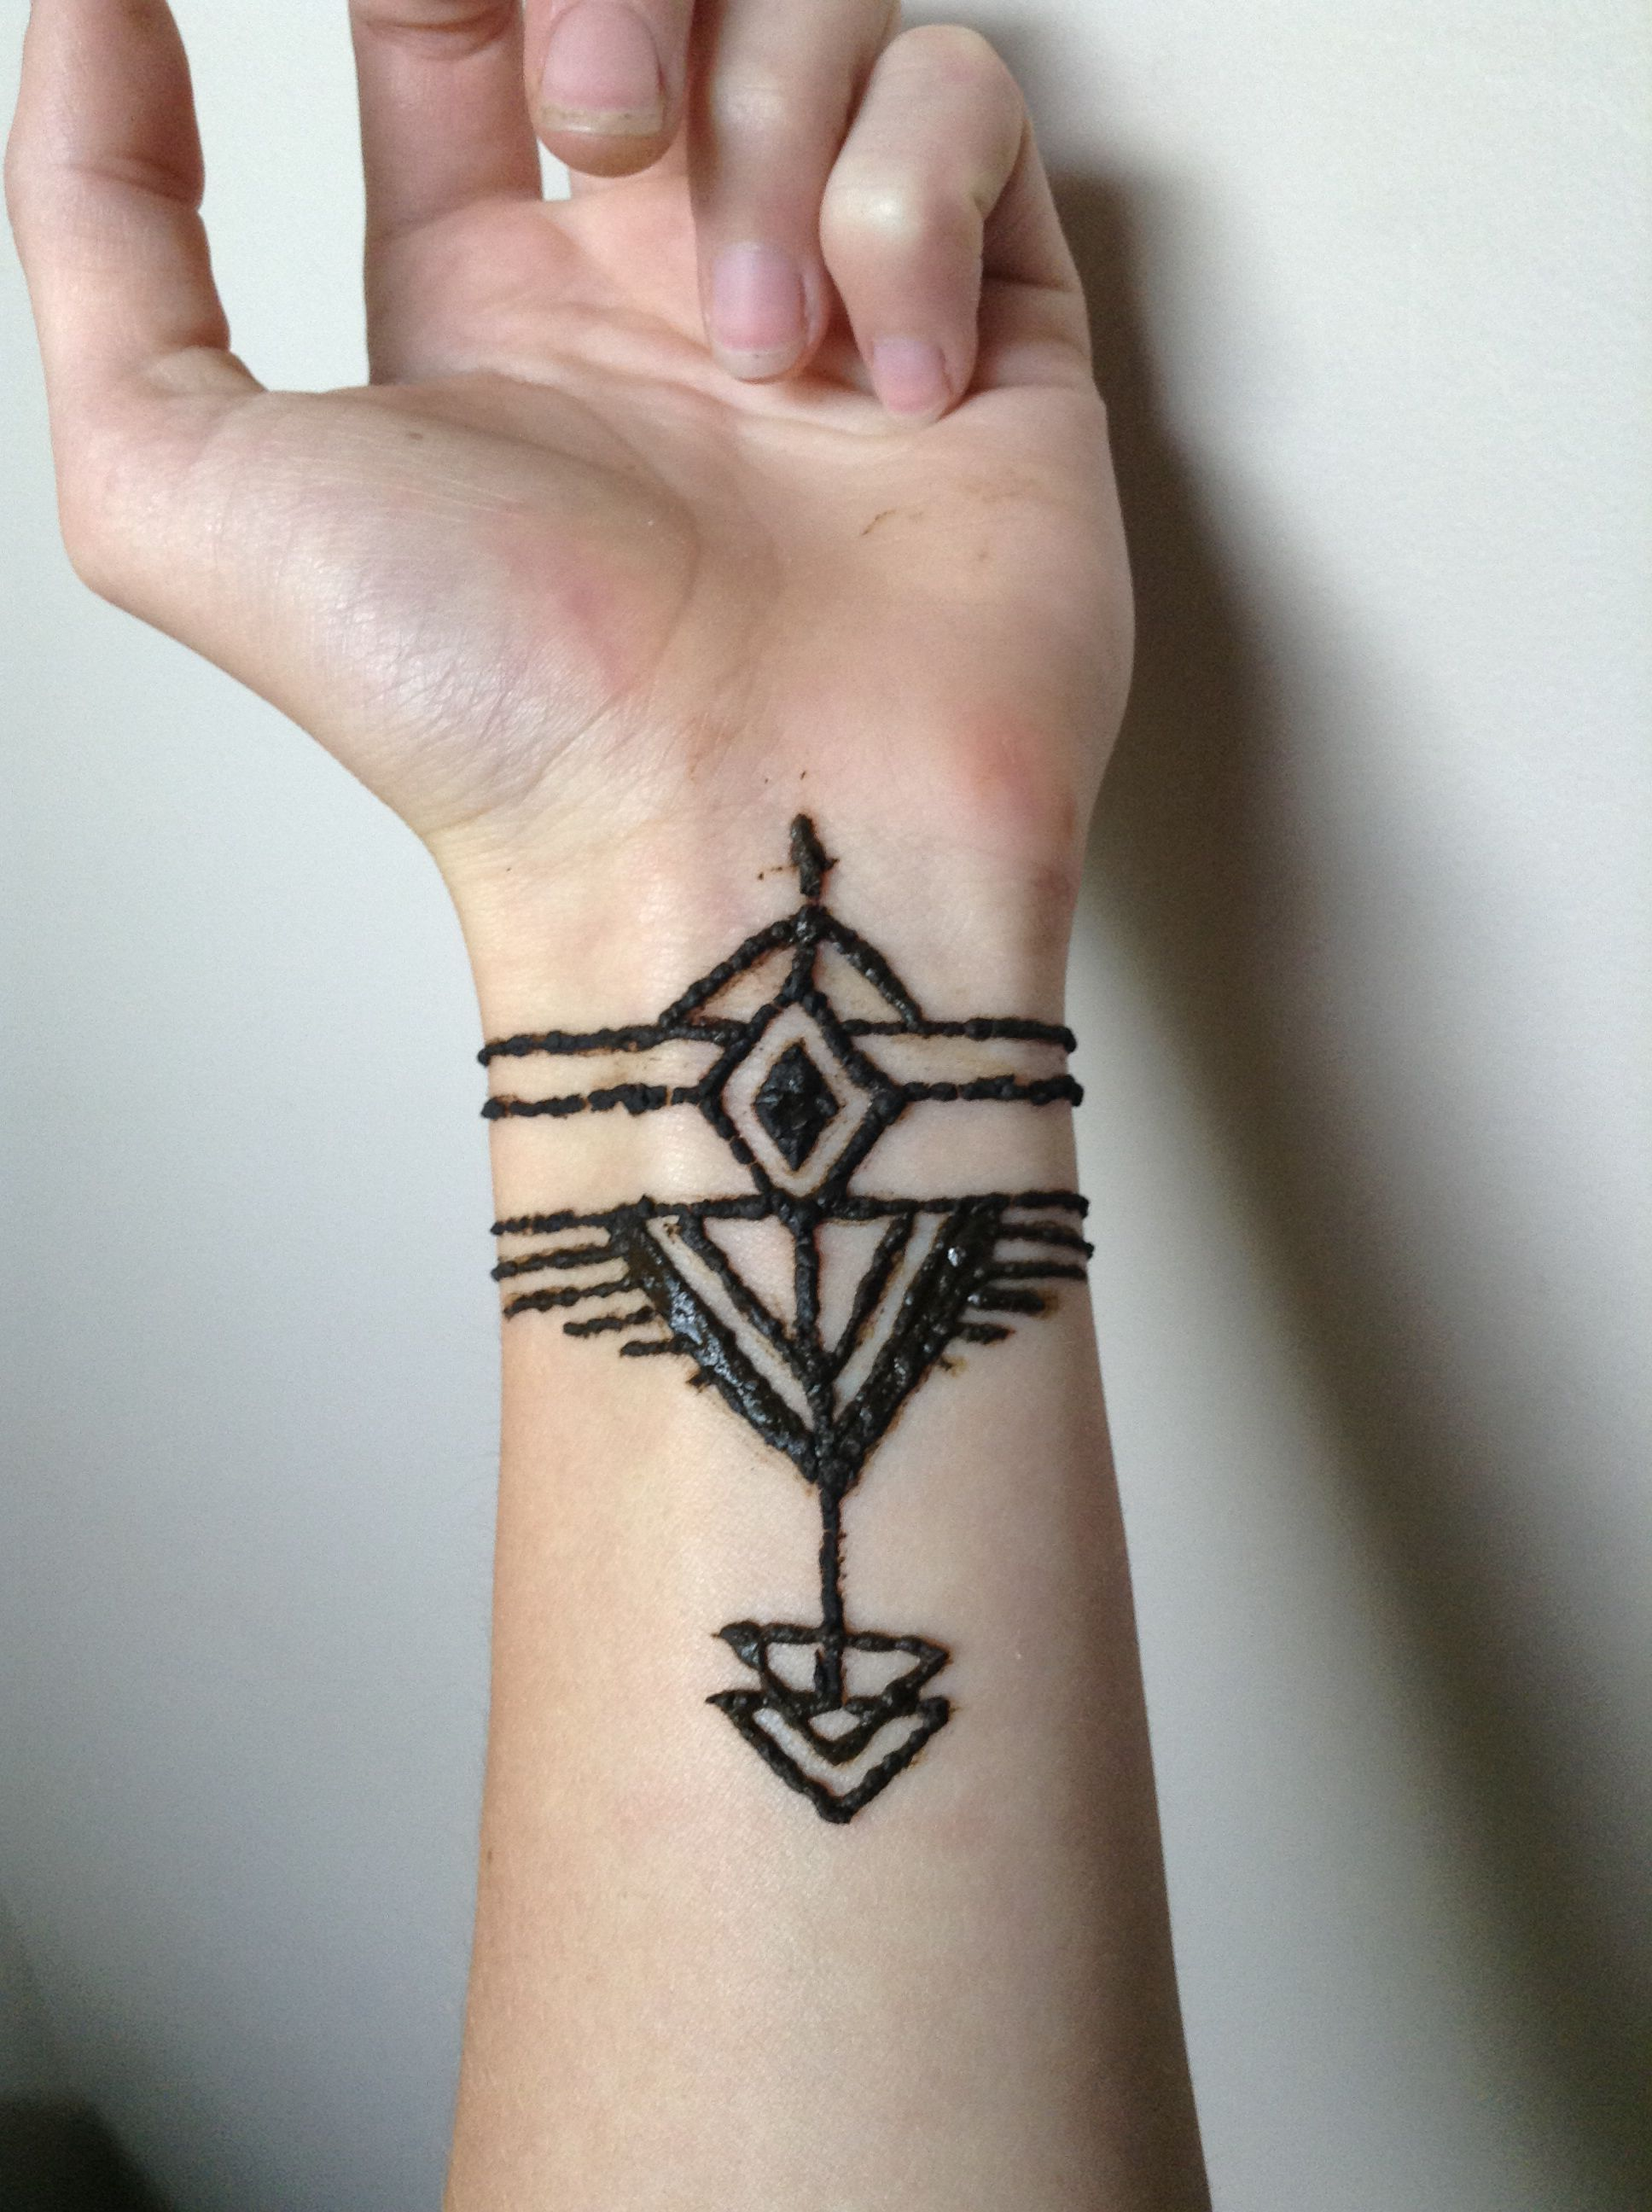 Henna Tattoo For Guys: Tribal Print Henna Tattoo Design